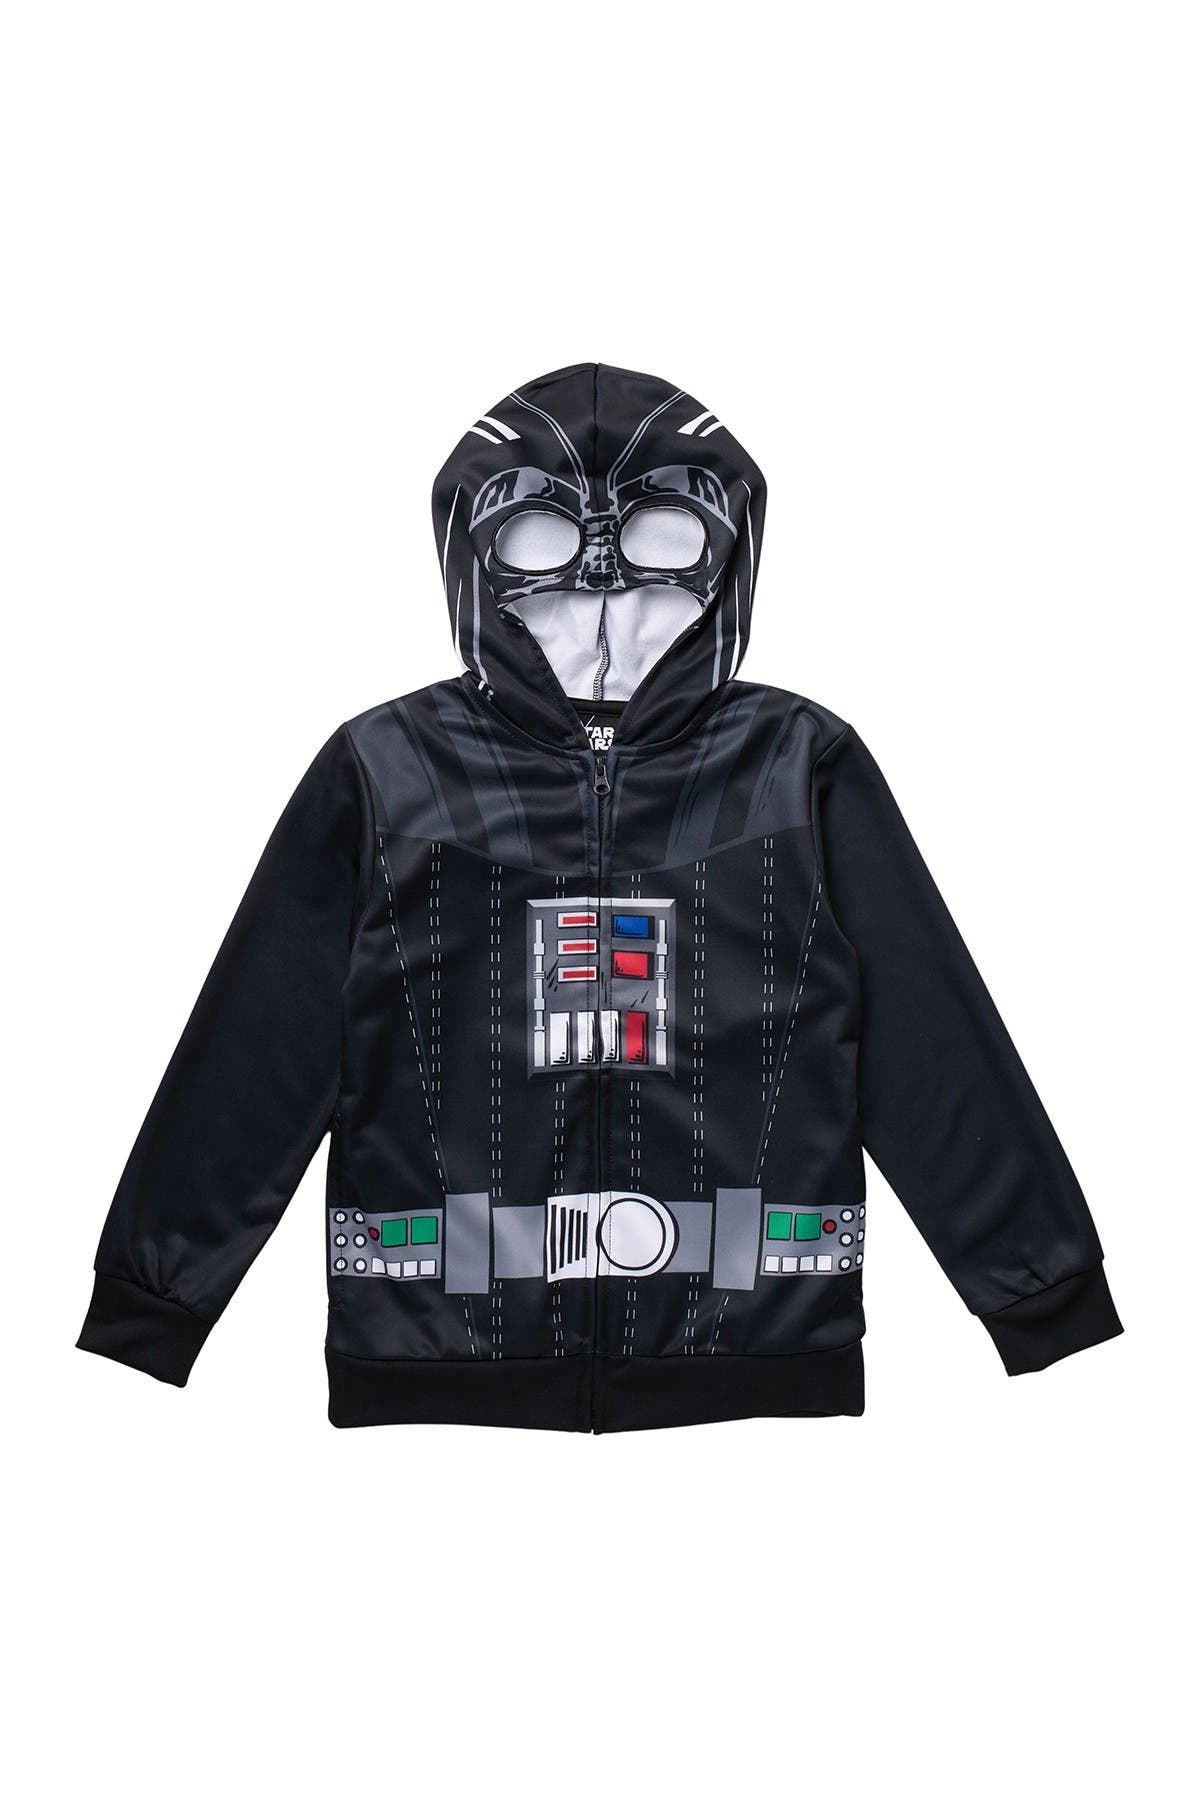 Image of JEM Darth Vader Costume Hoodie